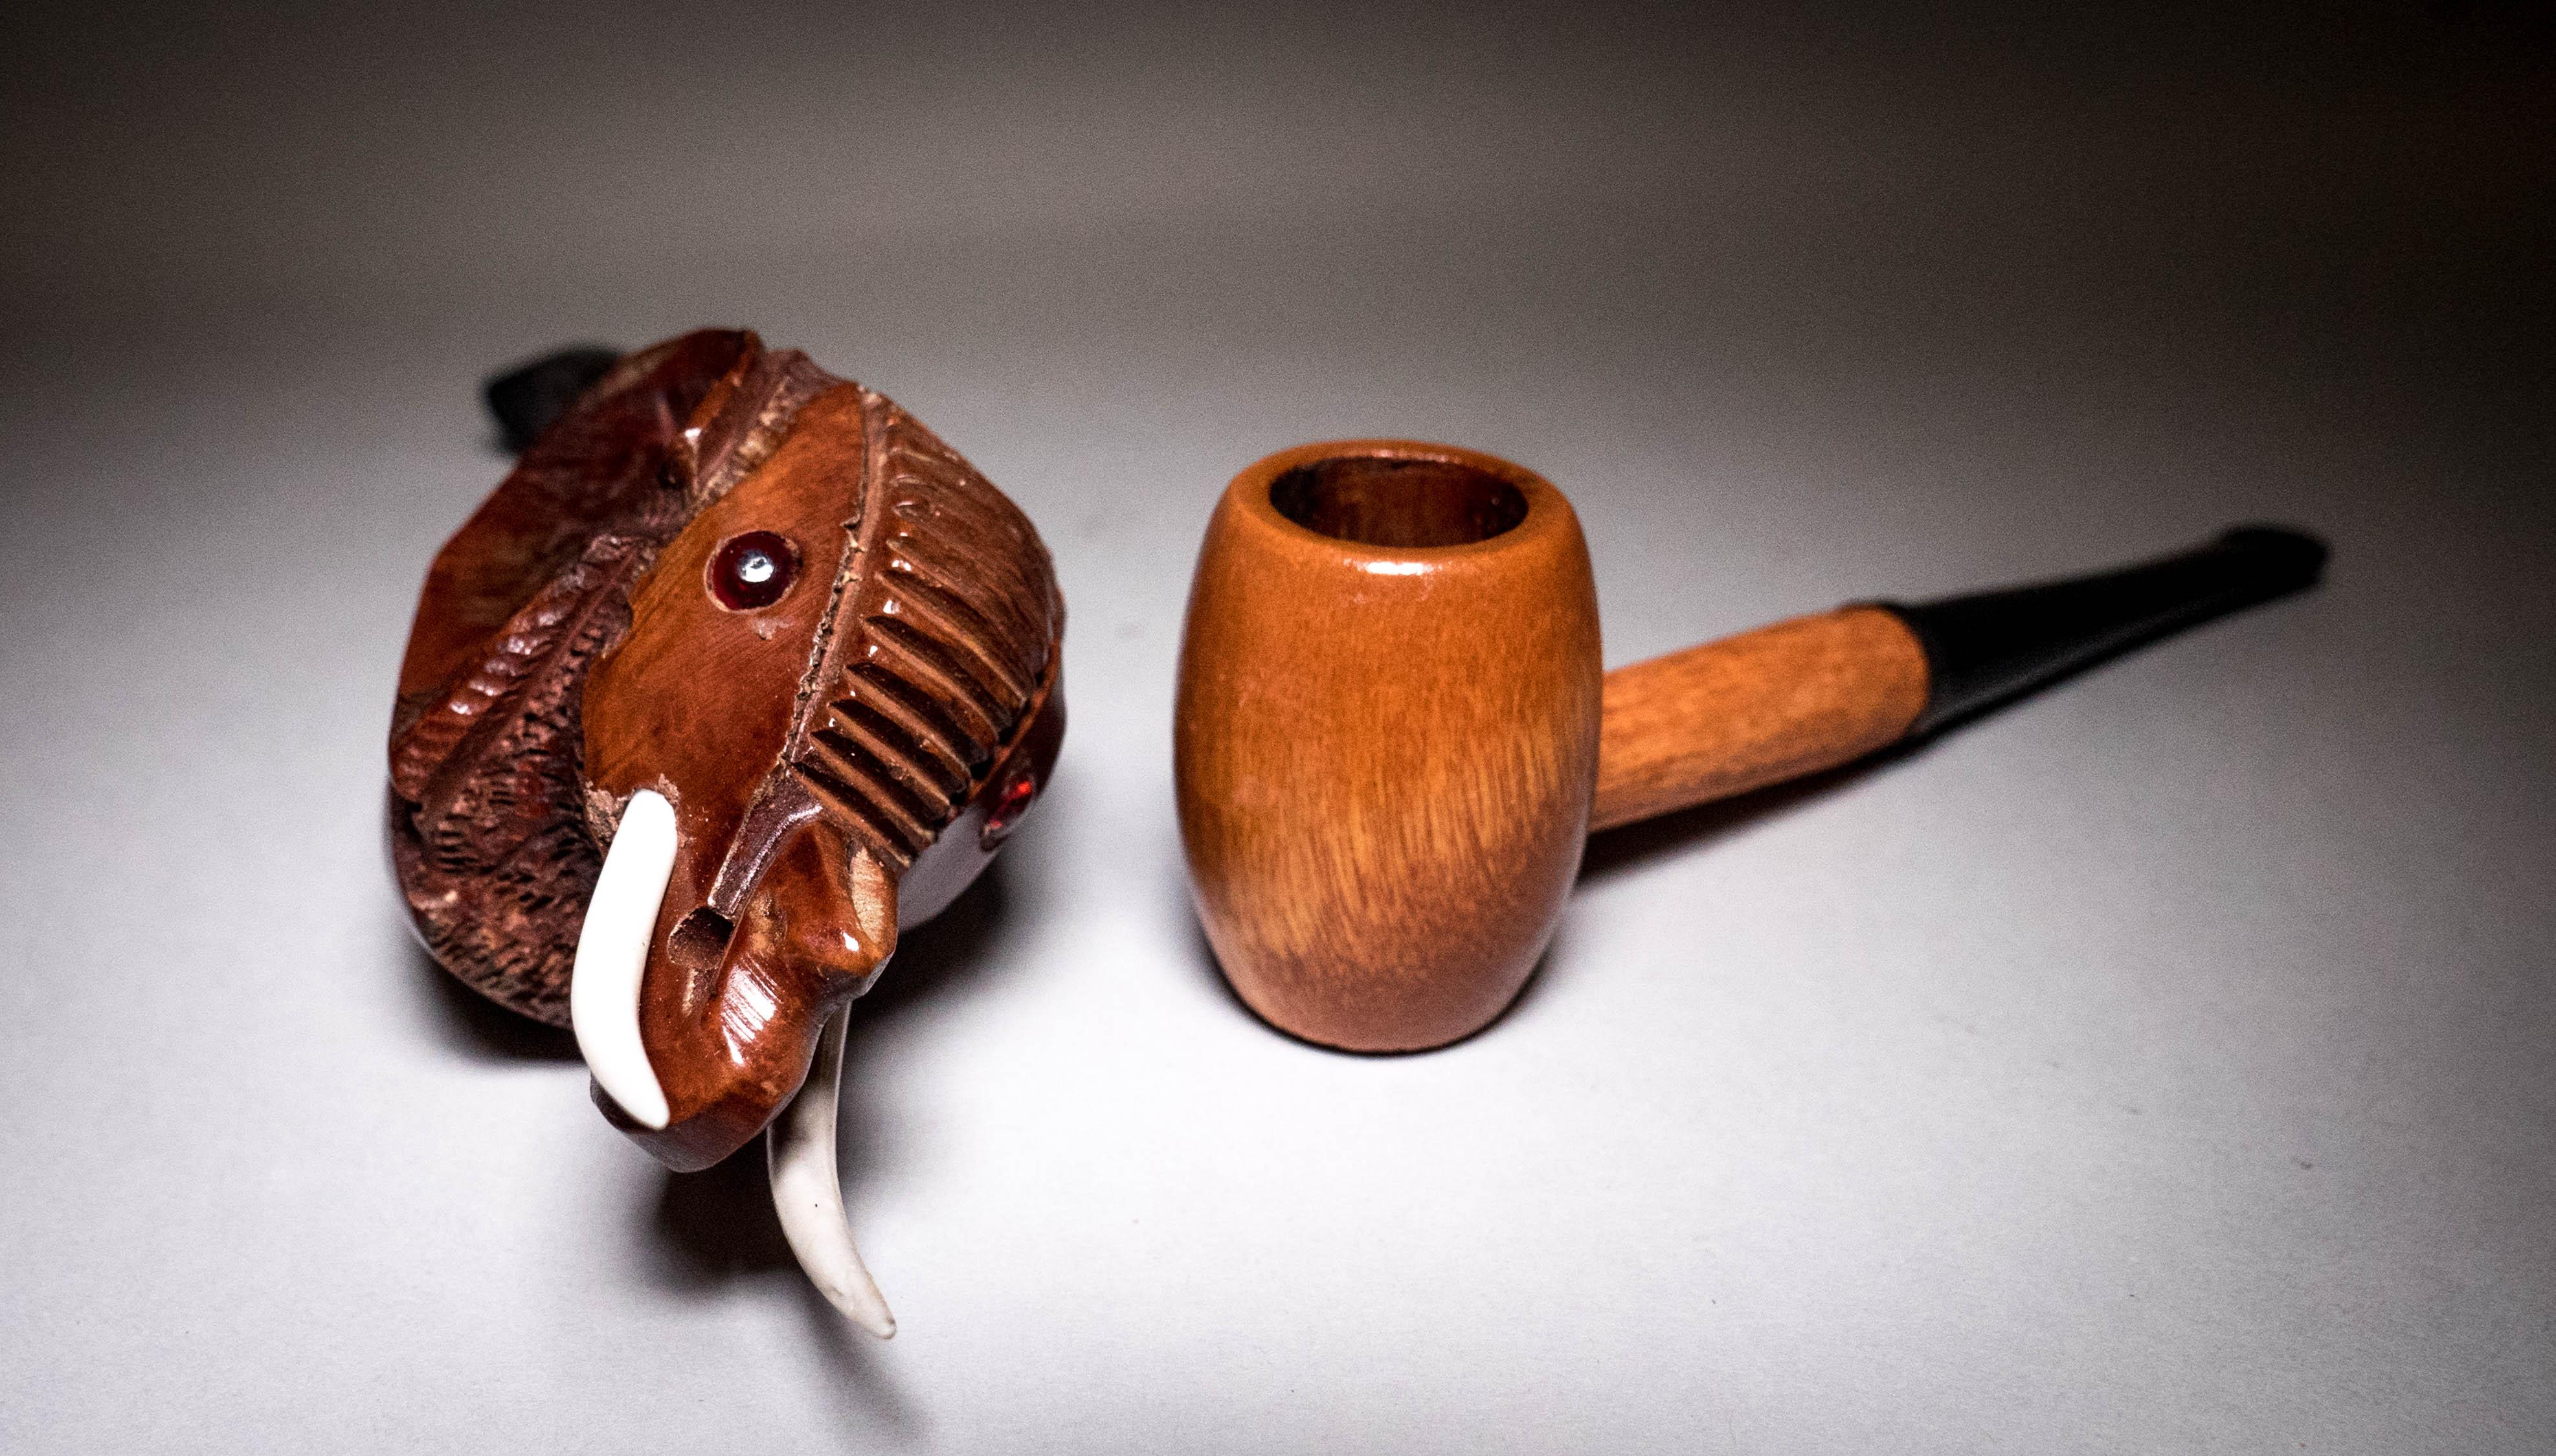 Pipe Materials - Wood